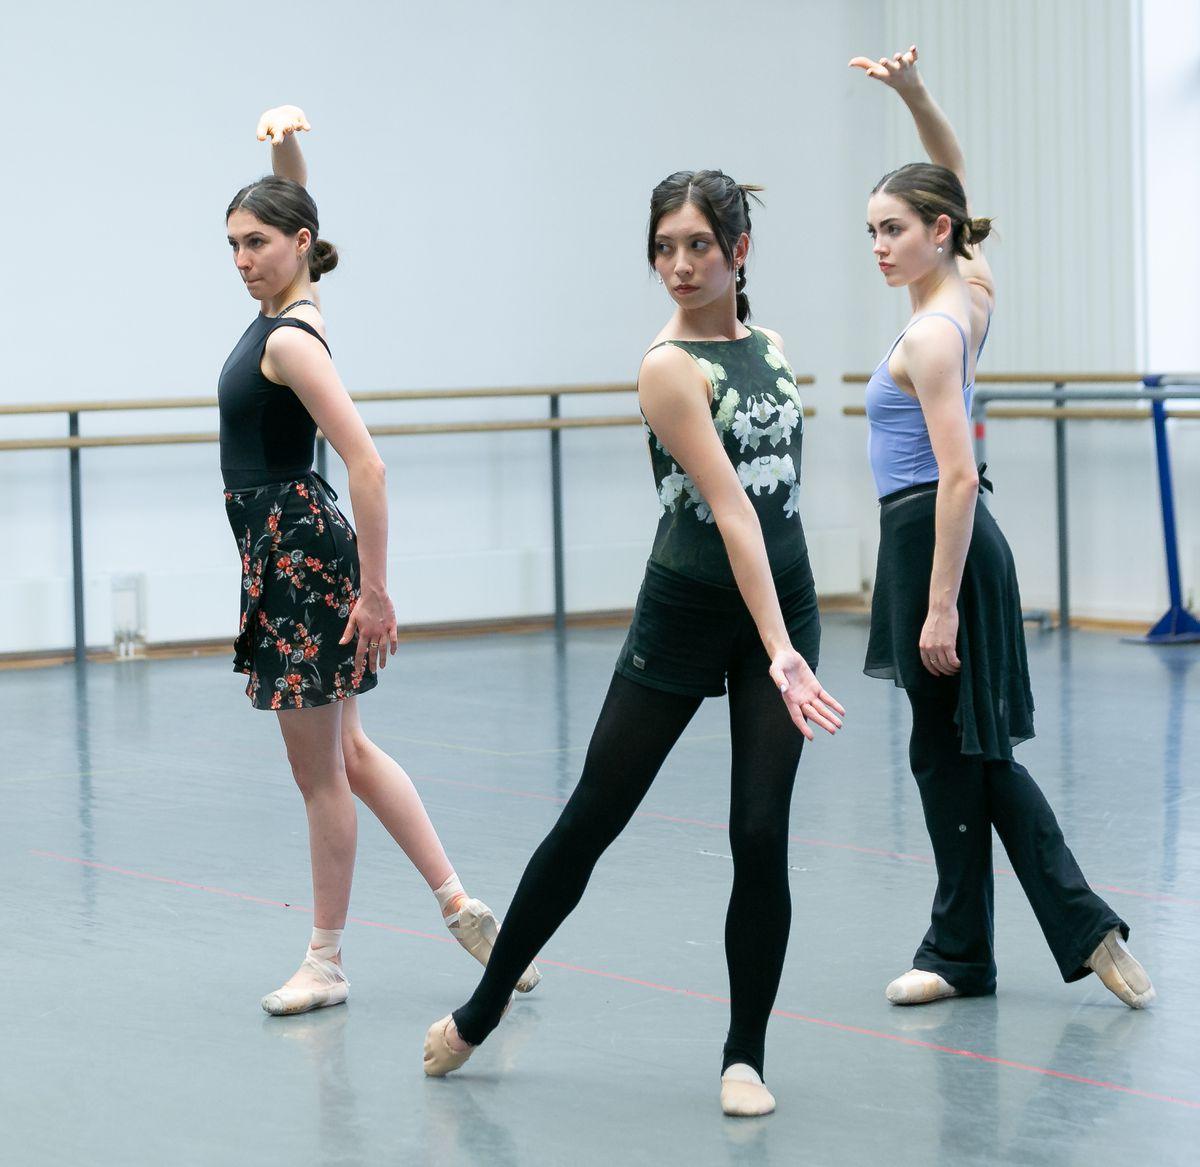 Tori Forsyth-Hecken, Alys Shee and Eilis Small as Hunters; photo Dasa Wharton